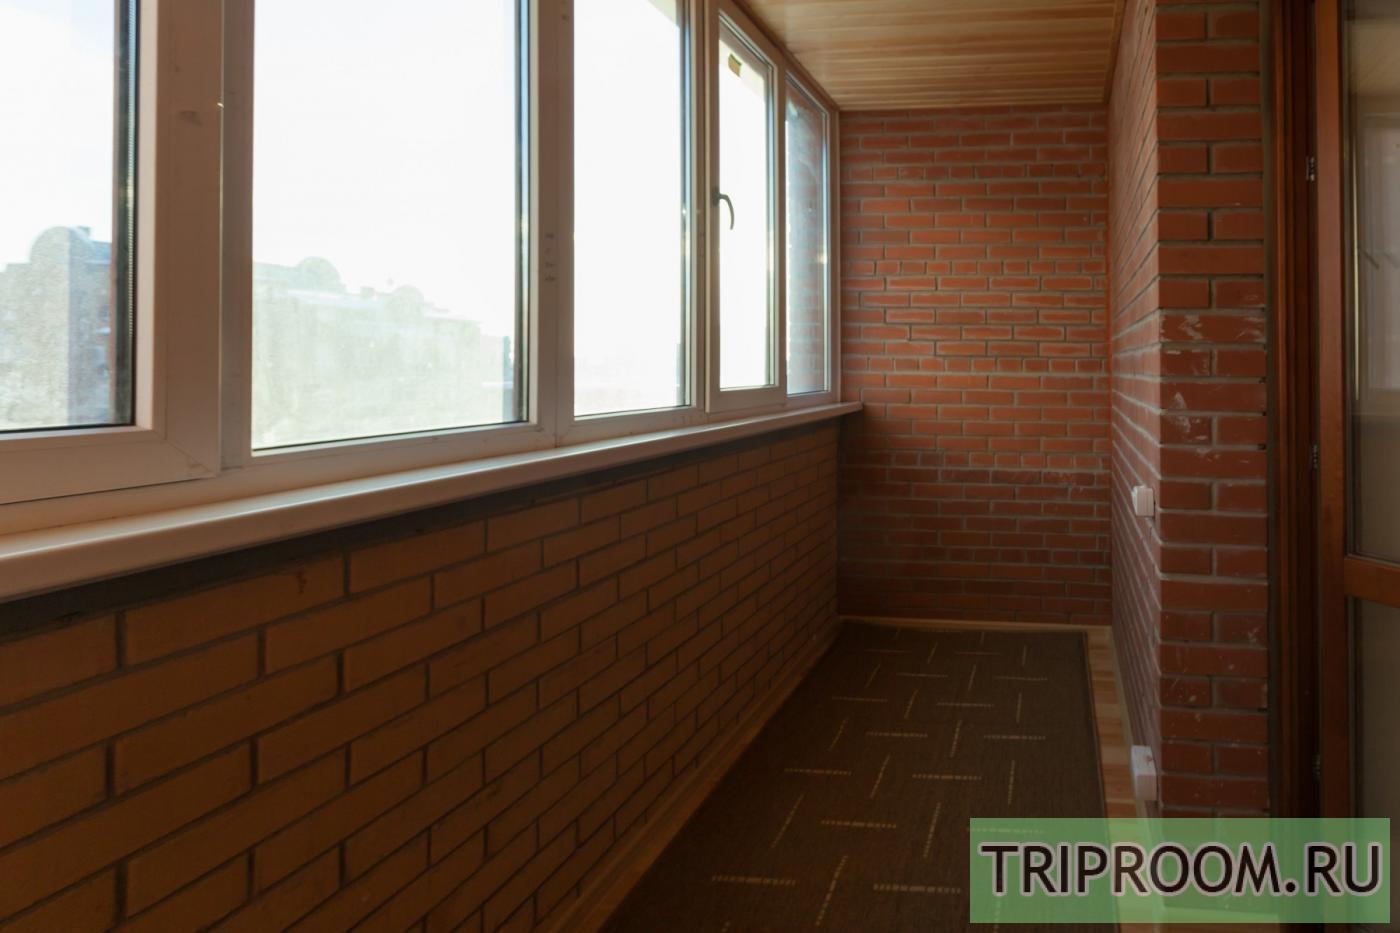 1-комнатная квартира посуточно (вариант № 17182), ул. Костычева улица, фото № 7